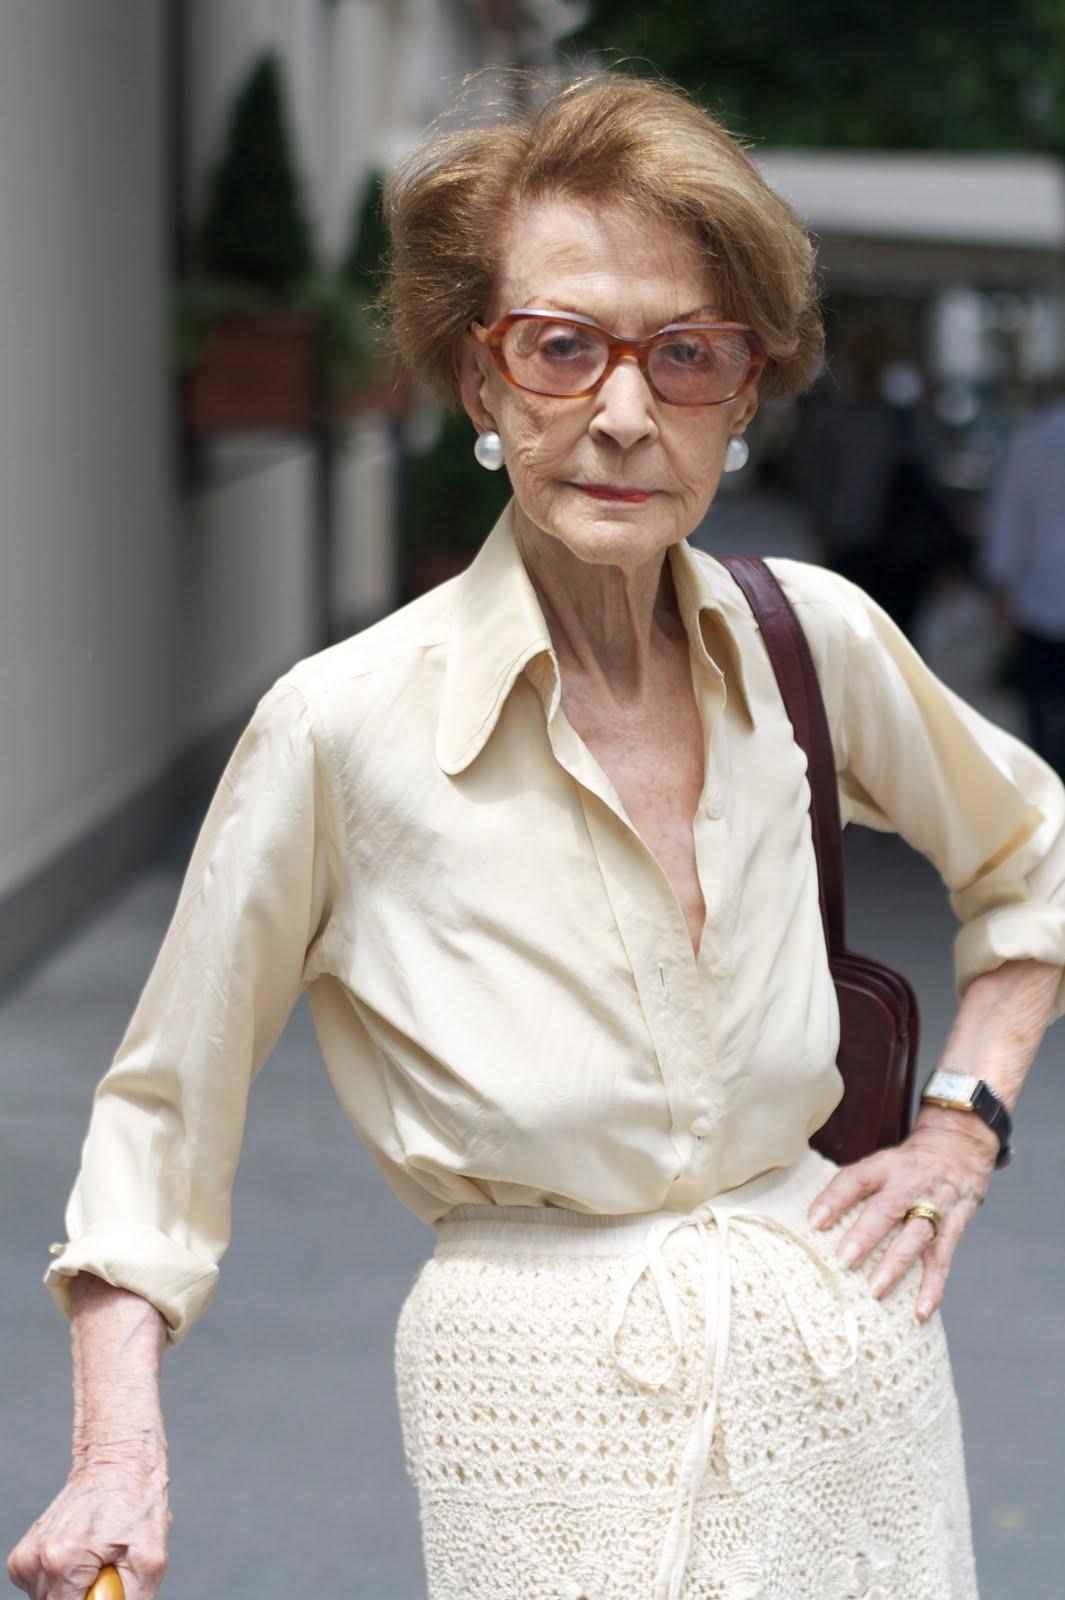 Old lady fashion show 87